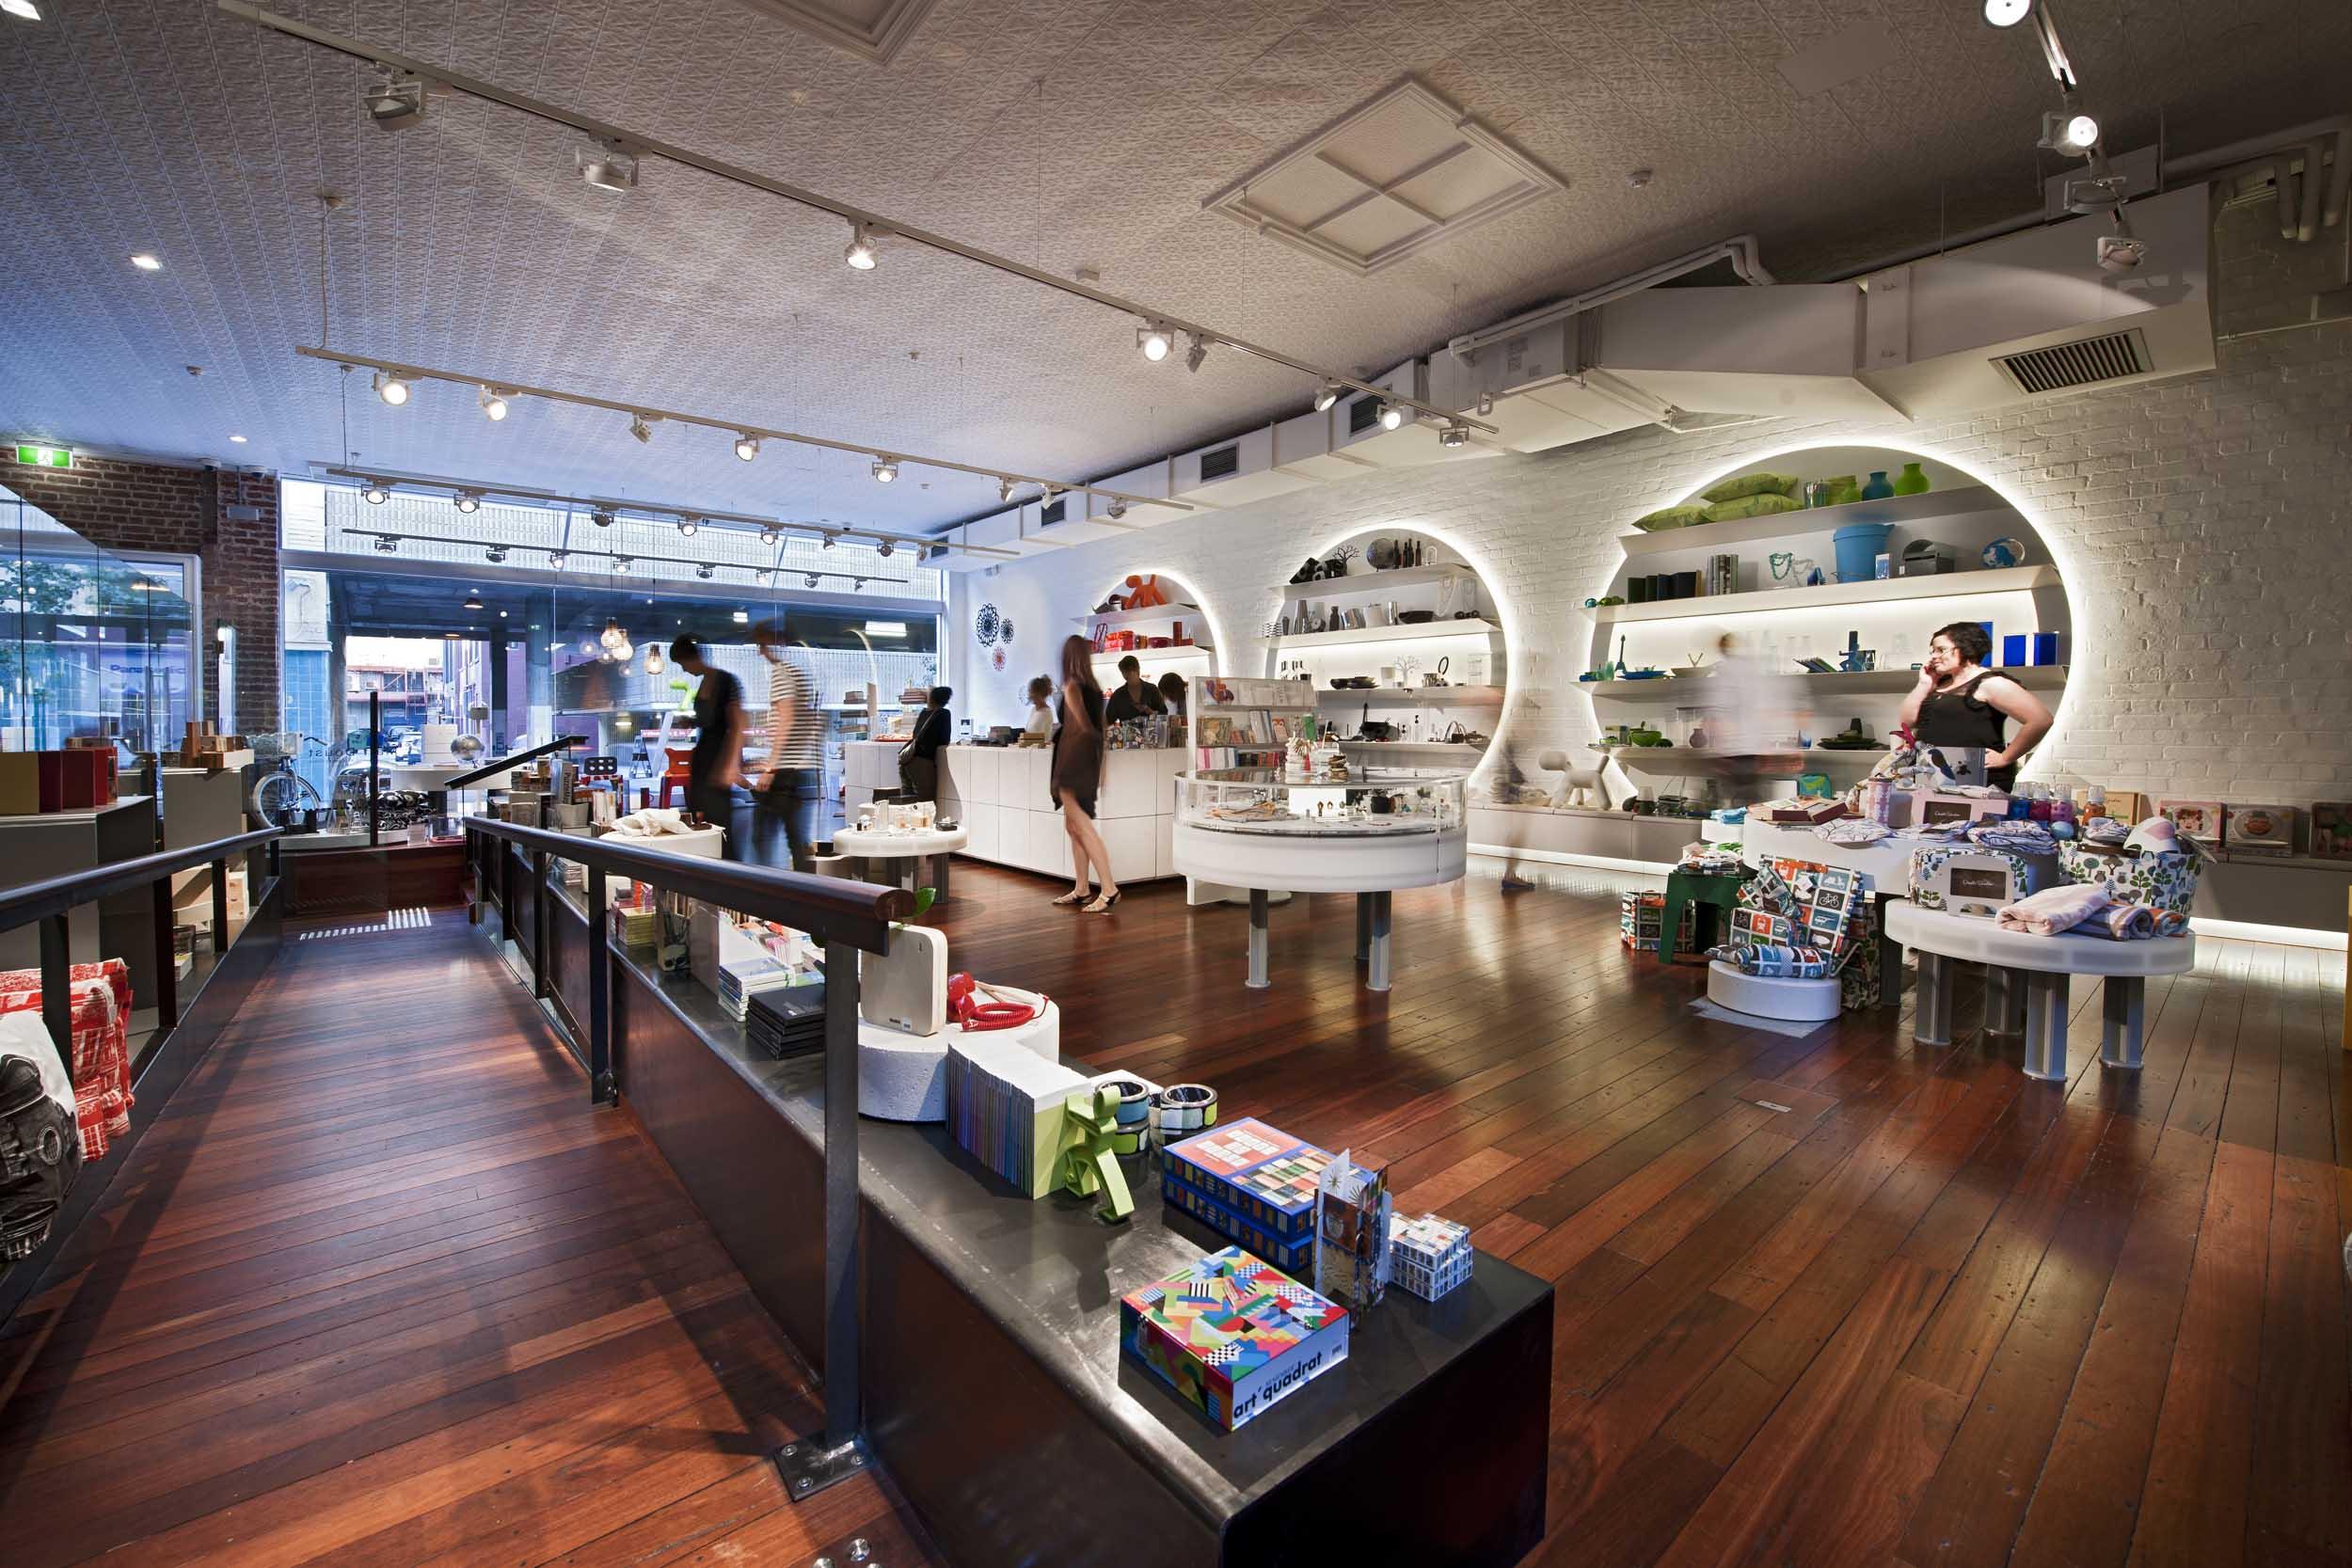 venn-bar-cafe-perth-architecture-western-australia-design-architect-commercial.jpg